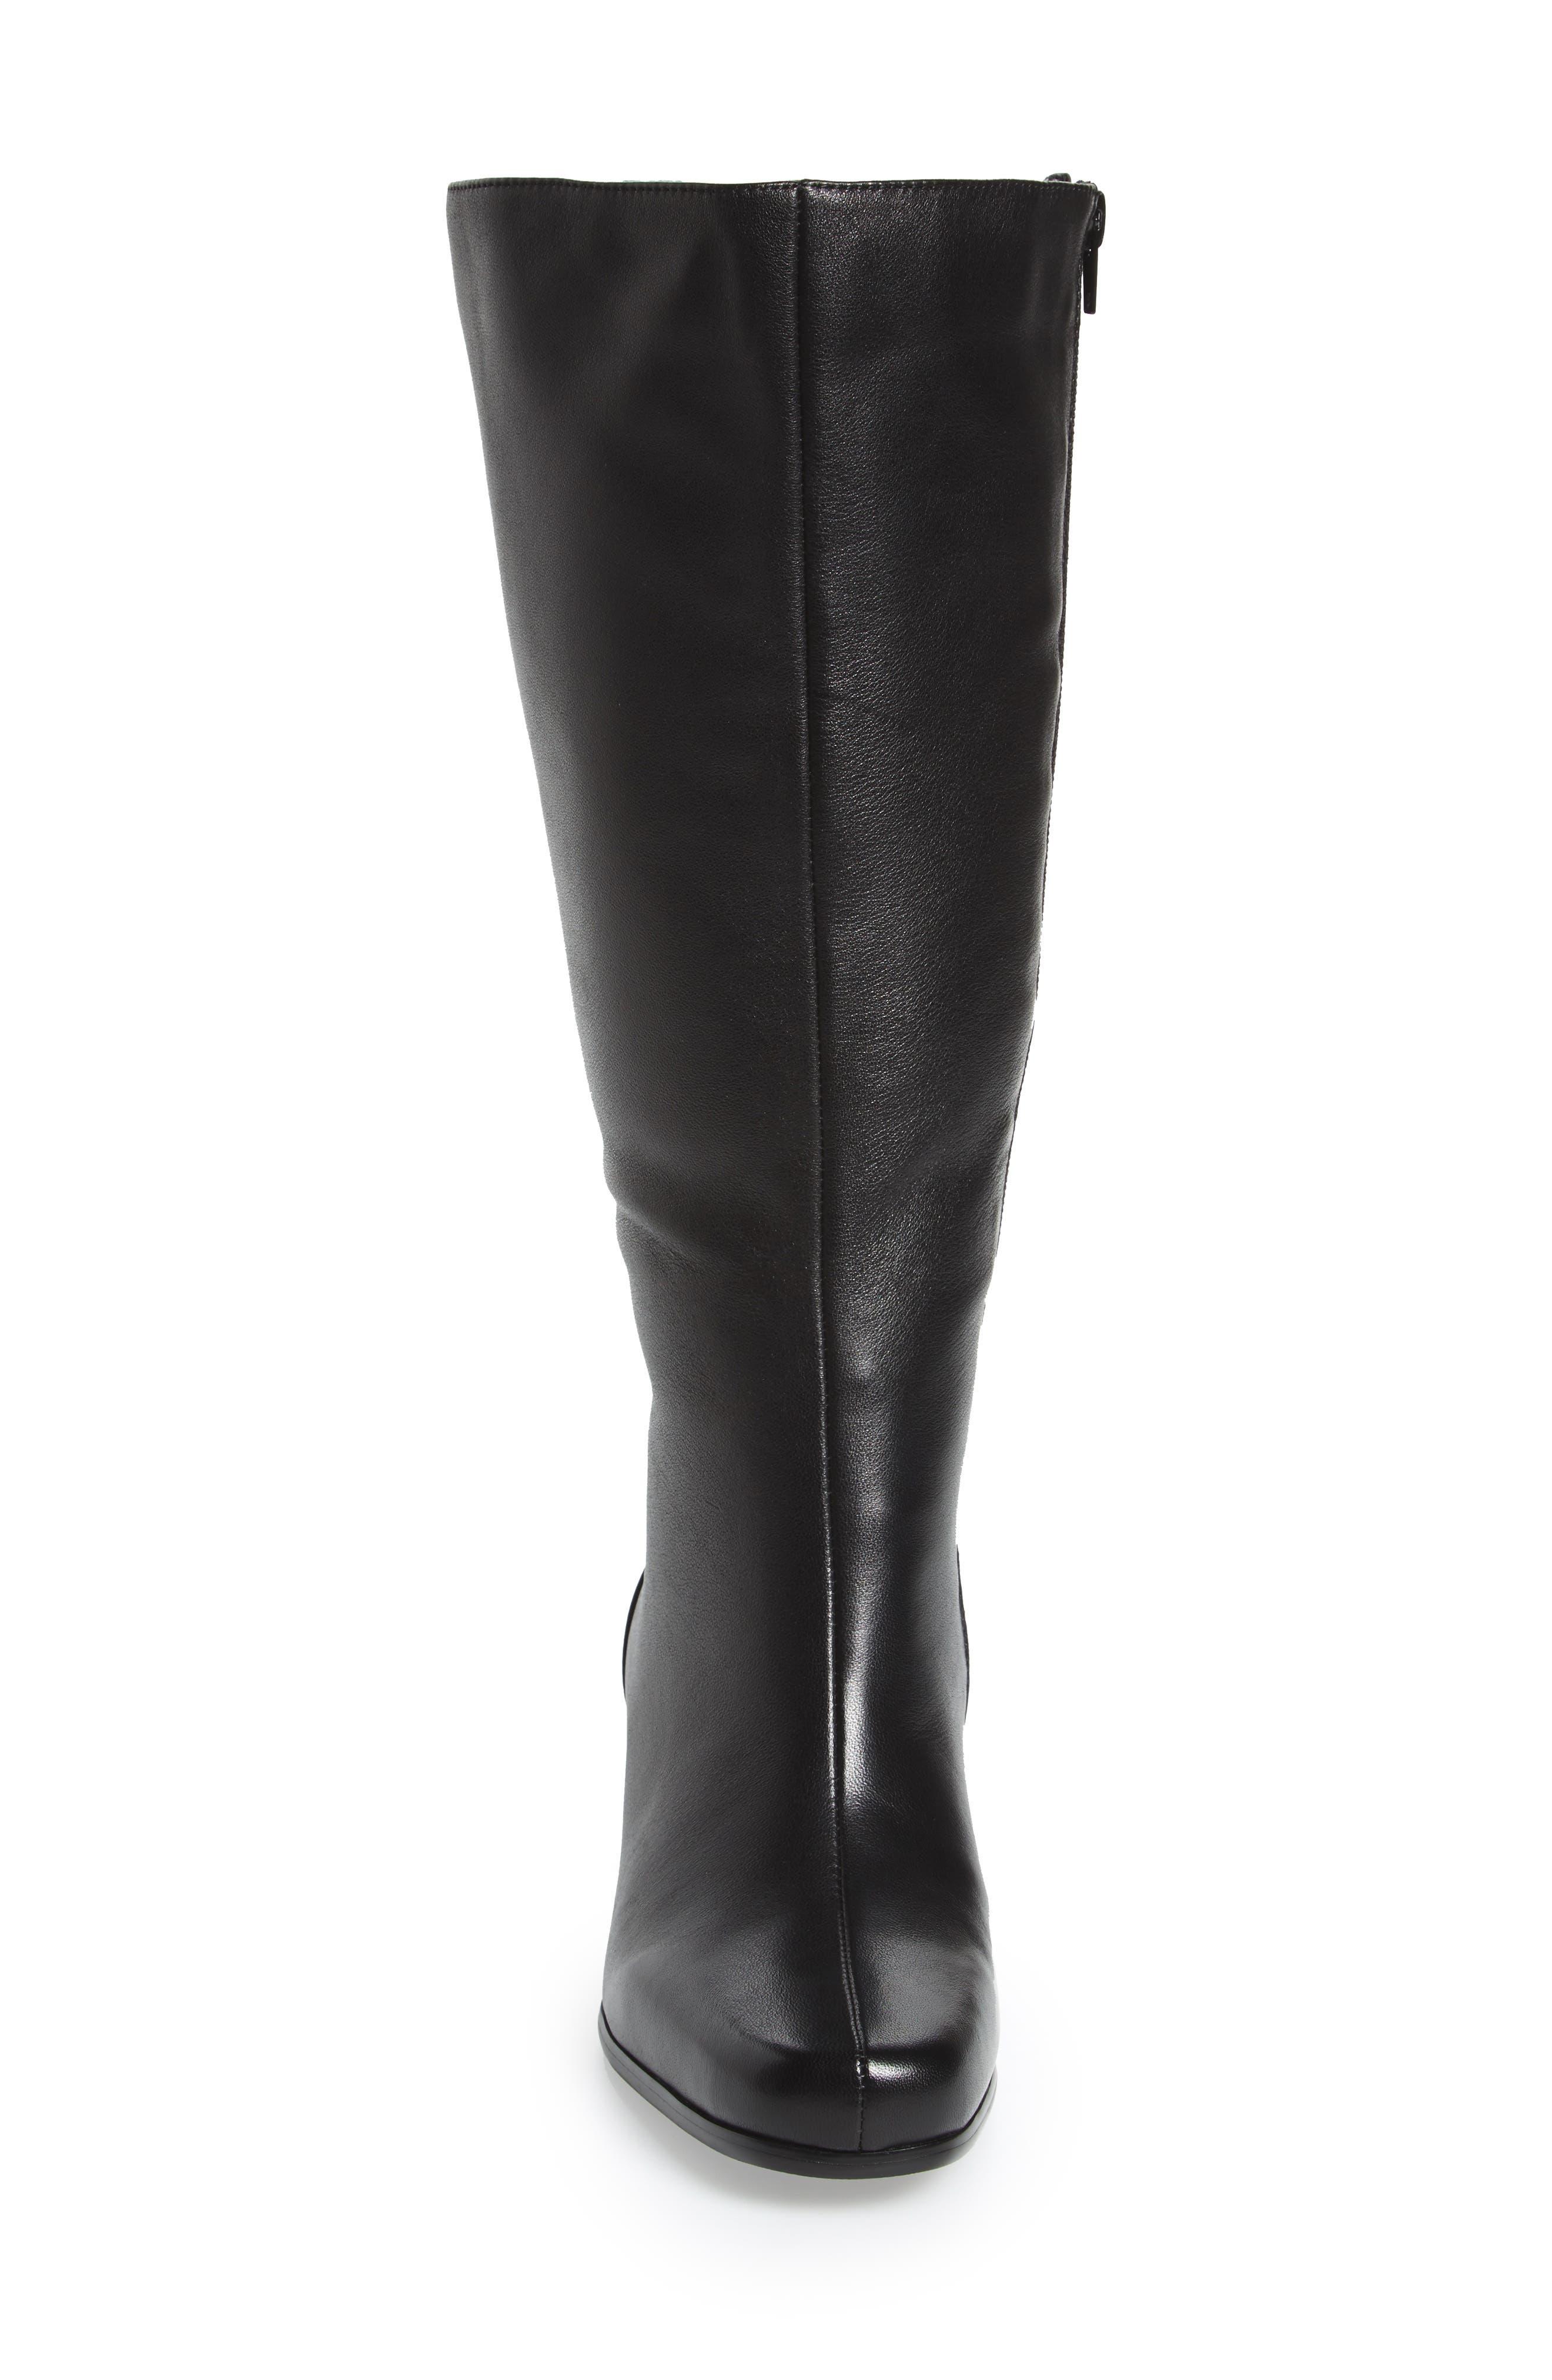 Tacoma 18 Tall Boot,                             Alternate thumbnail 4, color,                             Black Leather